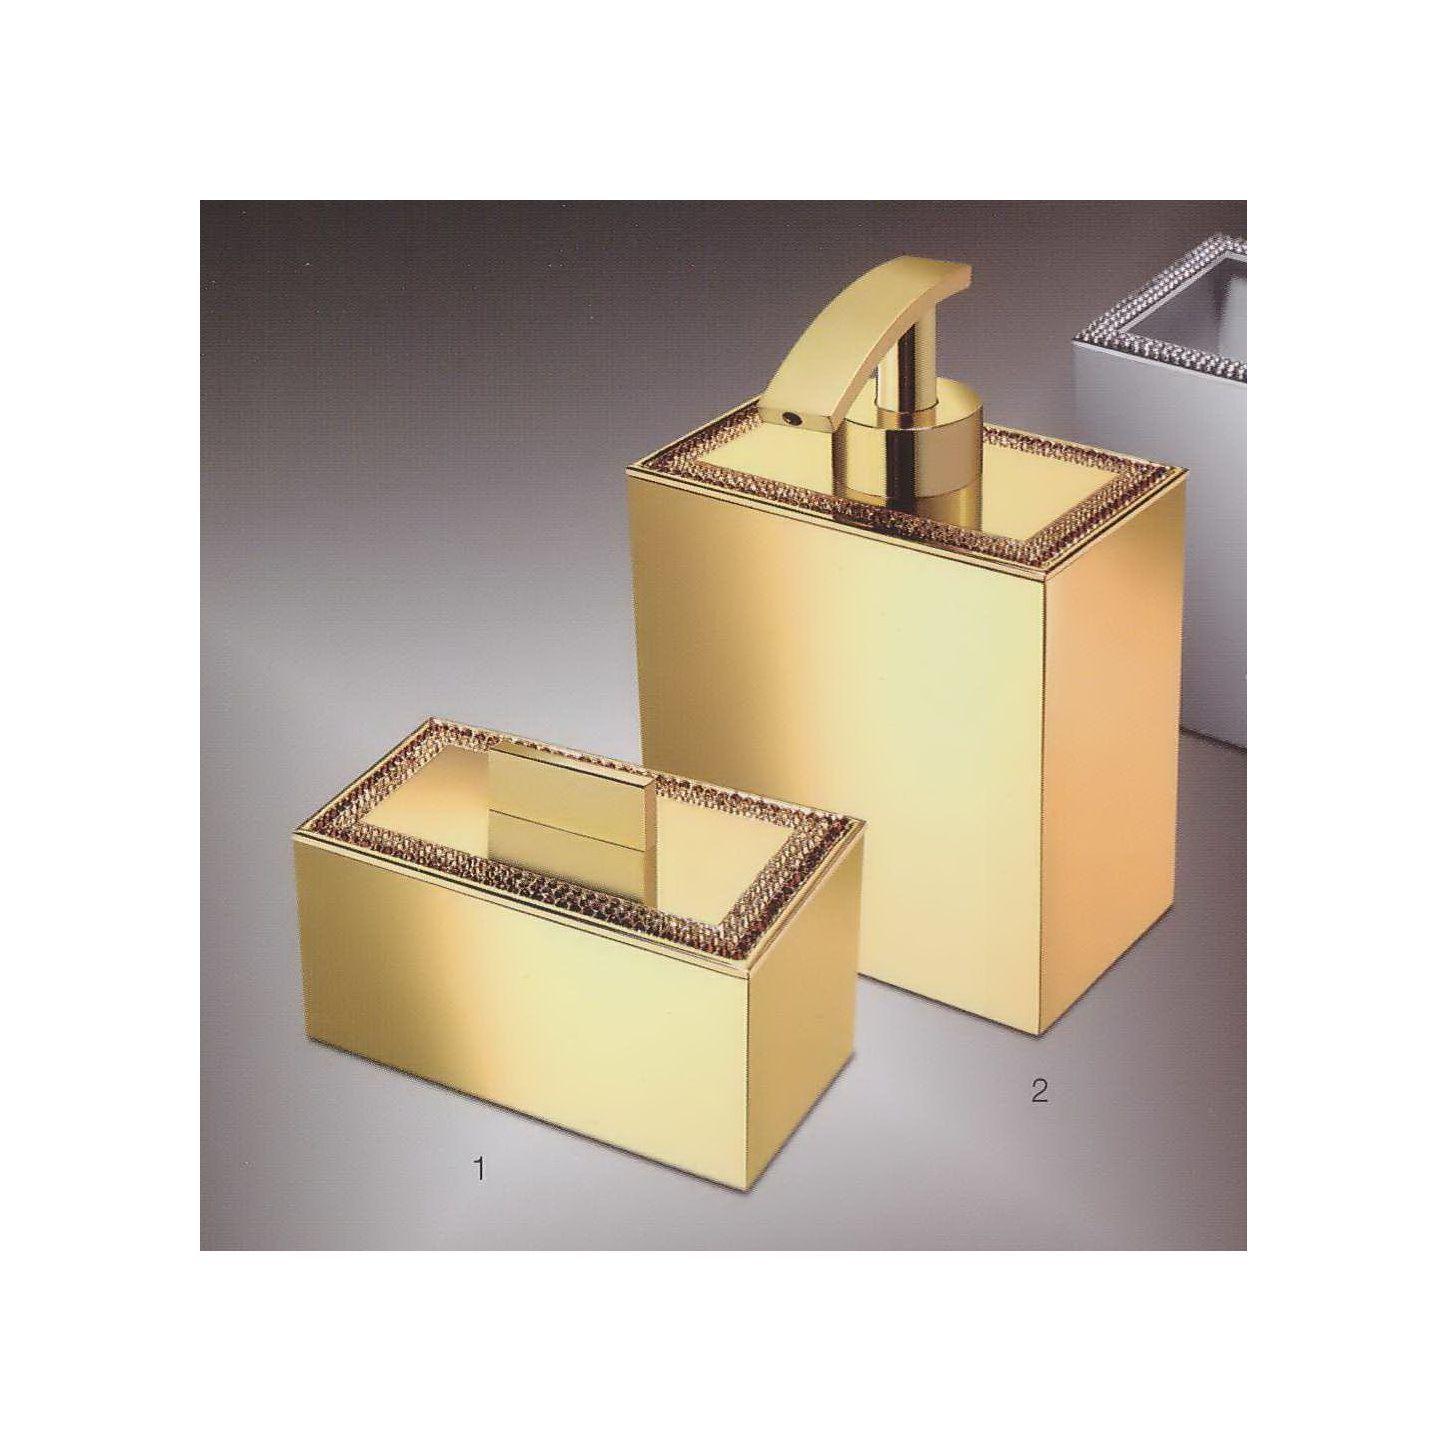 Баночки для косметики Емкость для косметики малая Windisch 88537O Shine Light Square yomkost-dlya-kosmetiki-malaya-88537o-shine-light-ot-windisch-ispaniya.jpg